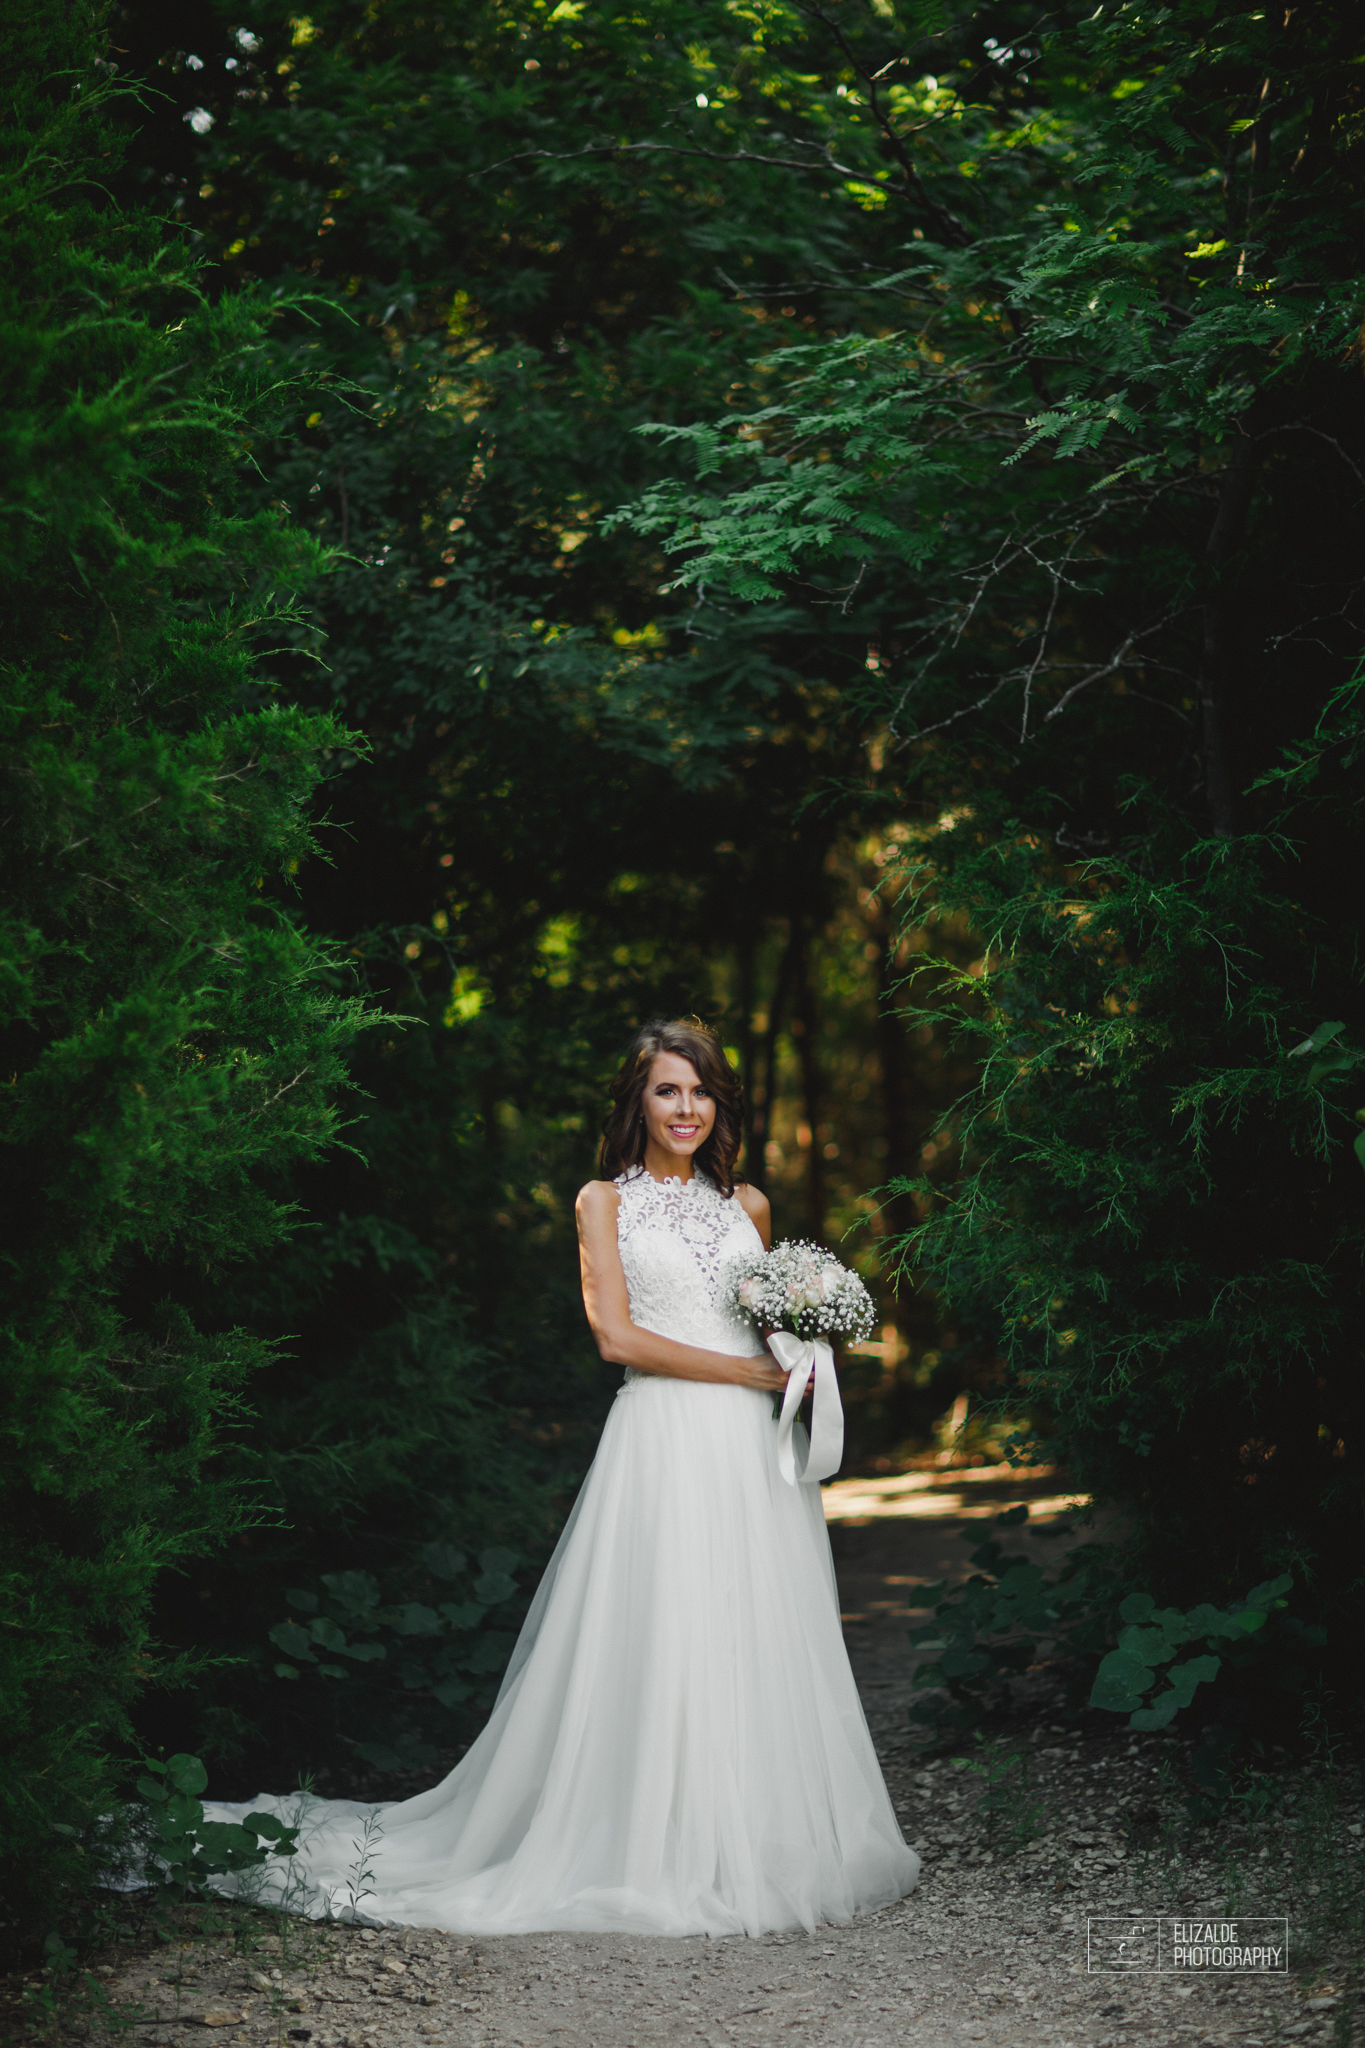 Bridal session_Dallas Photographer_Elizalde Photography_Denton photographer_ DFW Photographer_ Wedding Photographer_Baleigh3.jpg